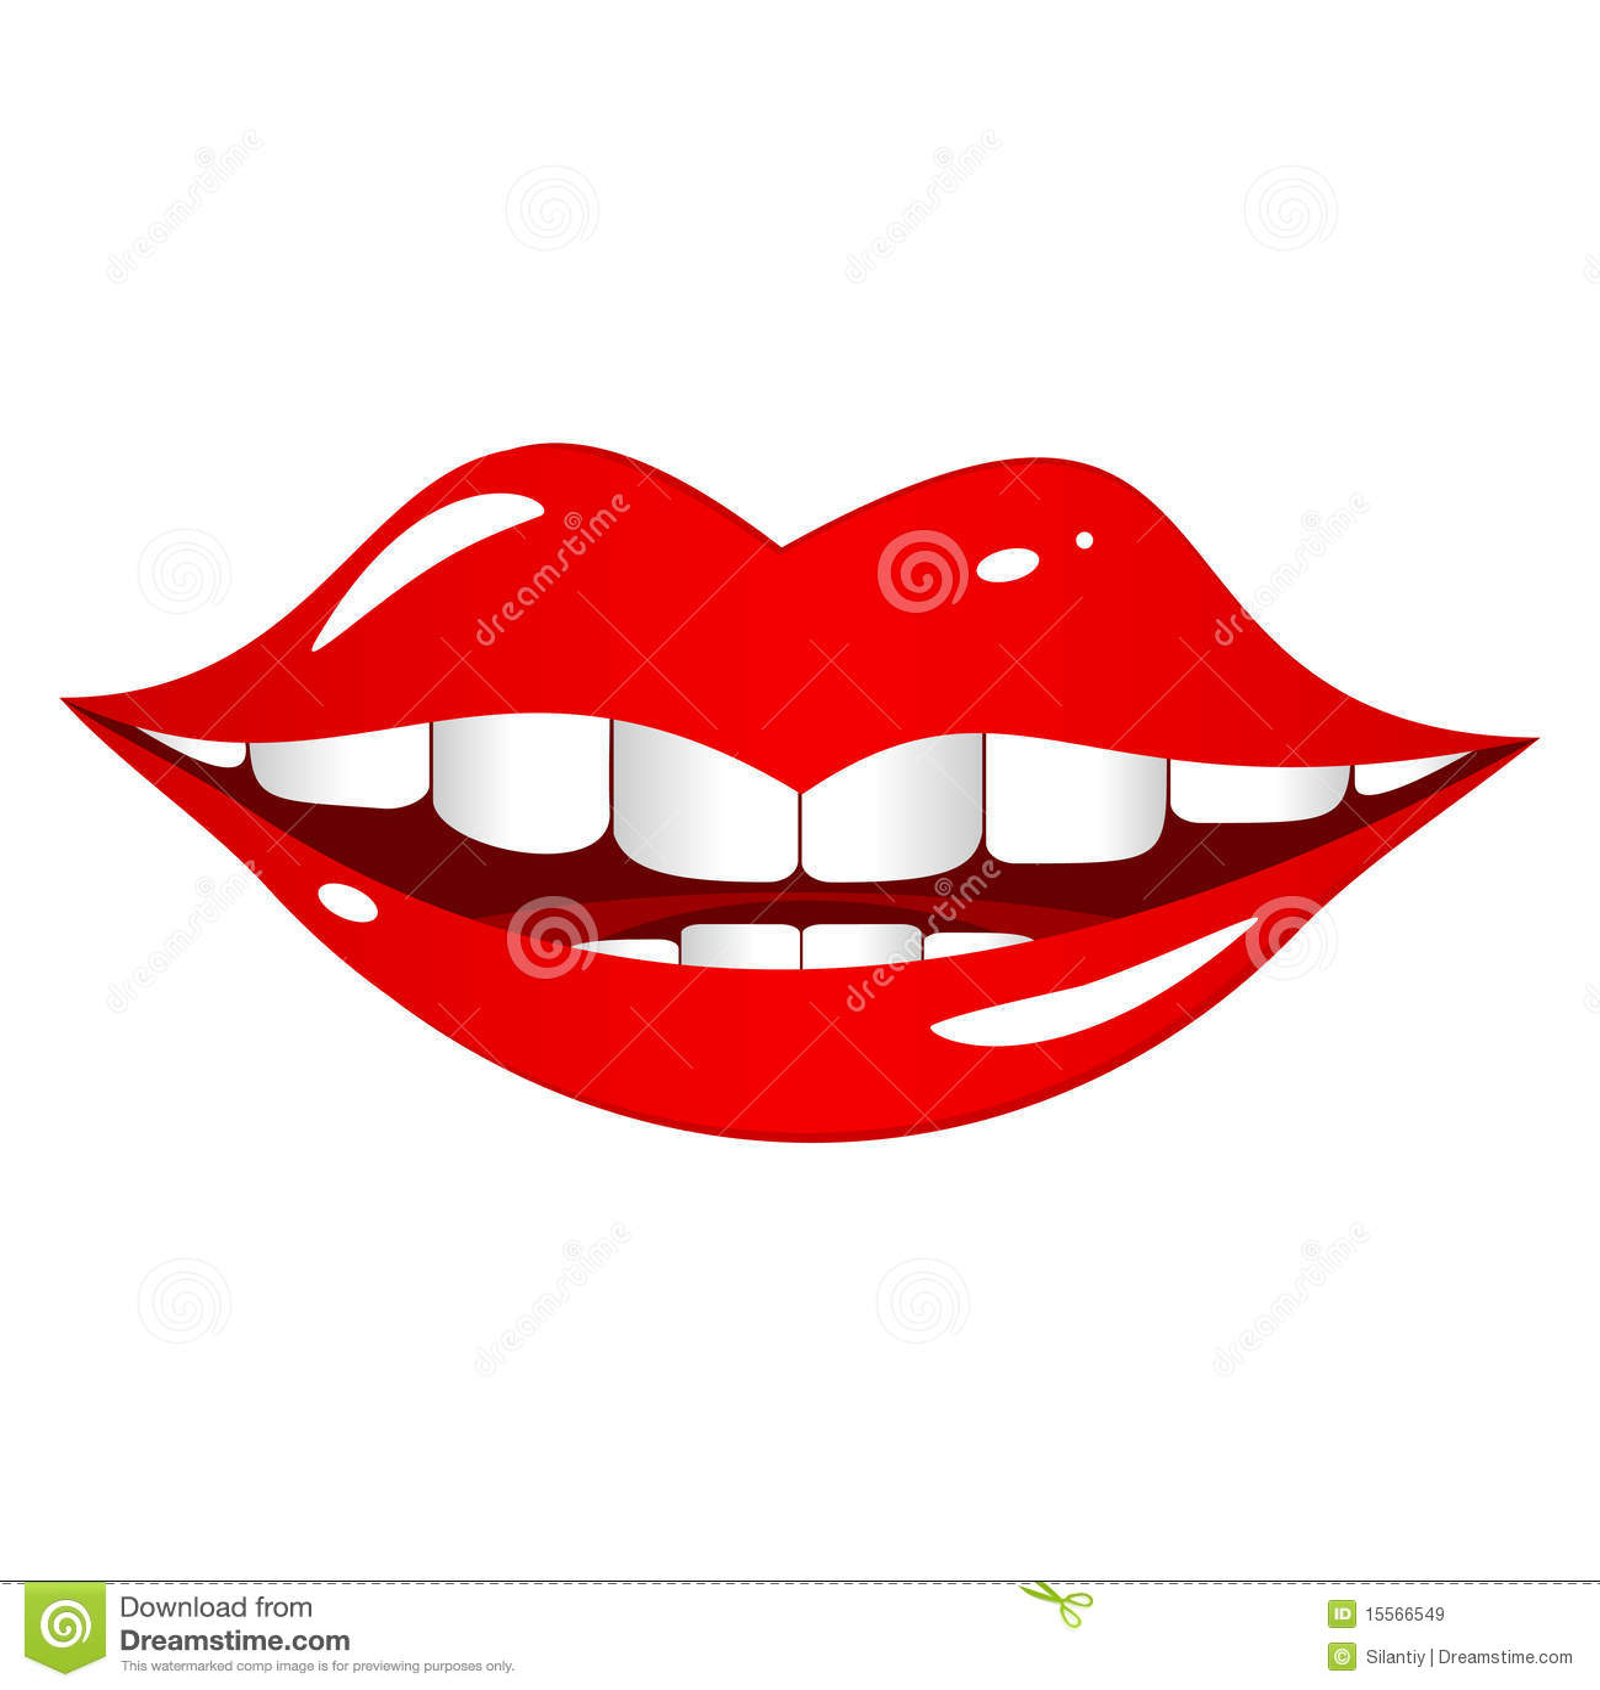 Clipart Smilies Seite 7 besides Little Girl Singing Vector 11623113 moreover Royalty Vrije Stock Afbeeldingen De Lach Van De Mond Image15566549 besides Raccoon Cartoon Vector 5191995 together with Moth 282160. on cartoon smile clip art